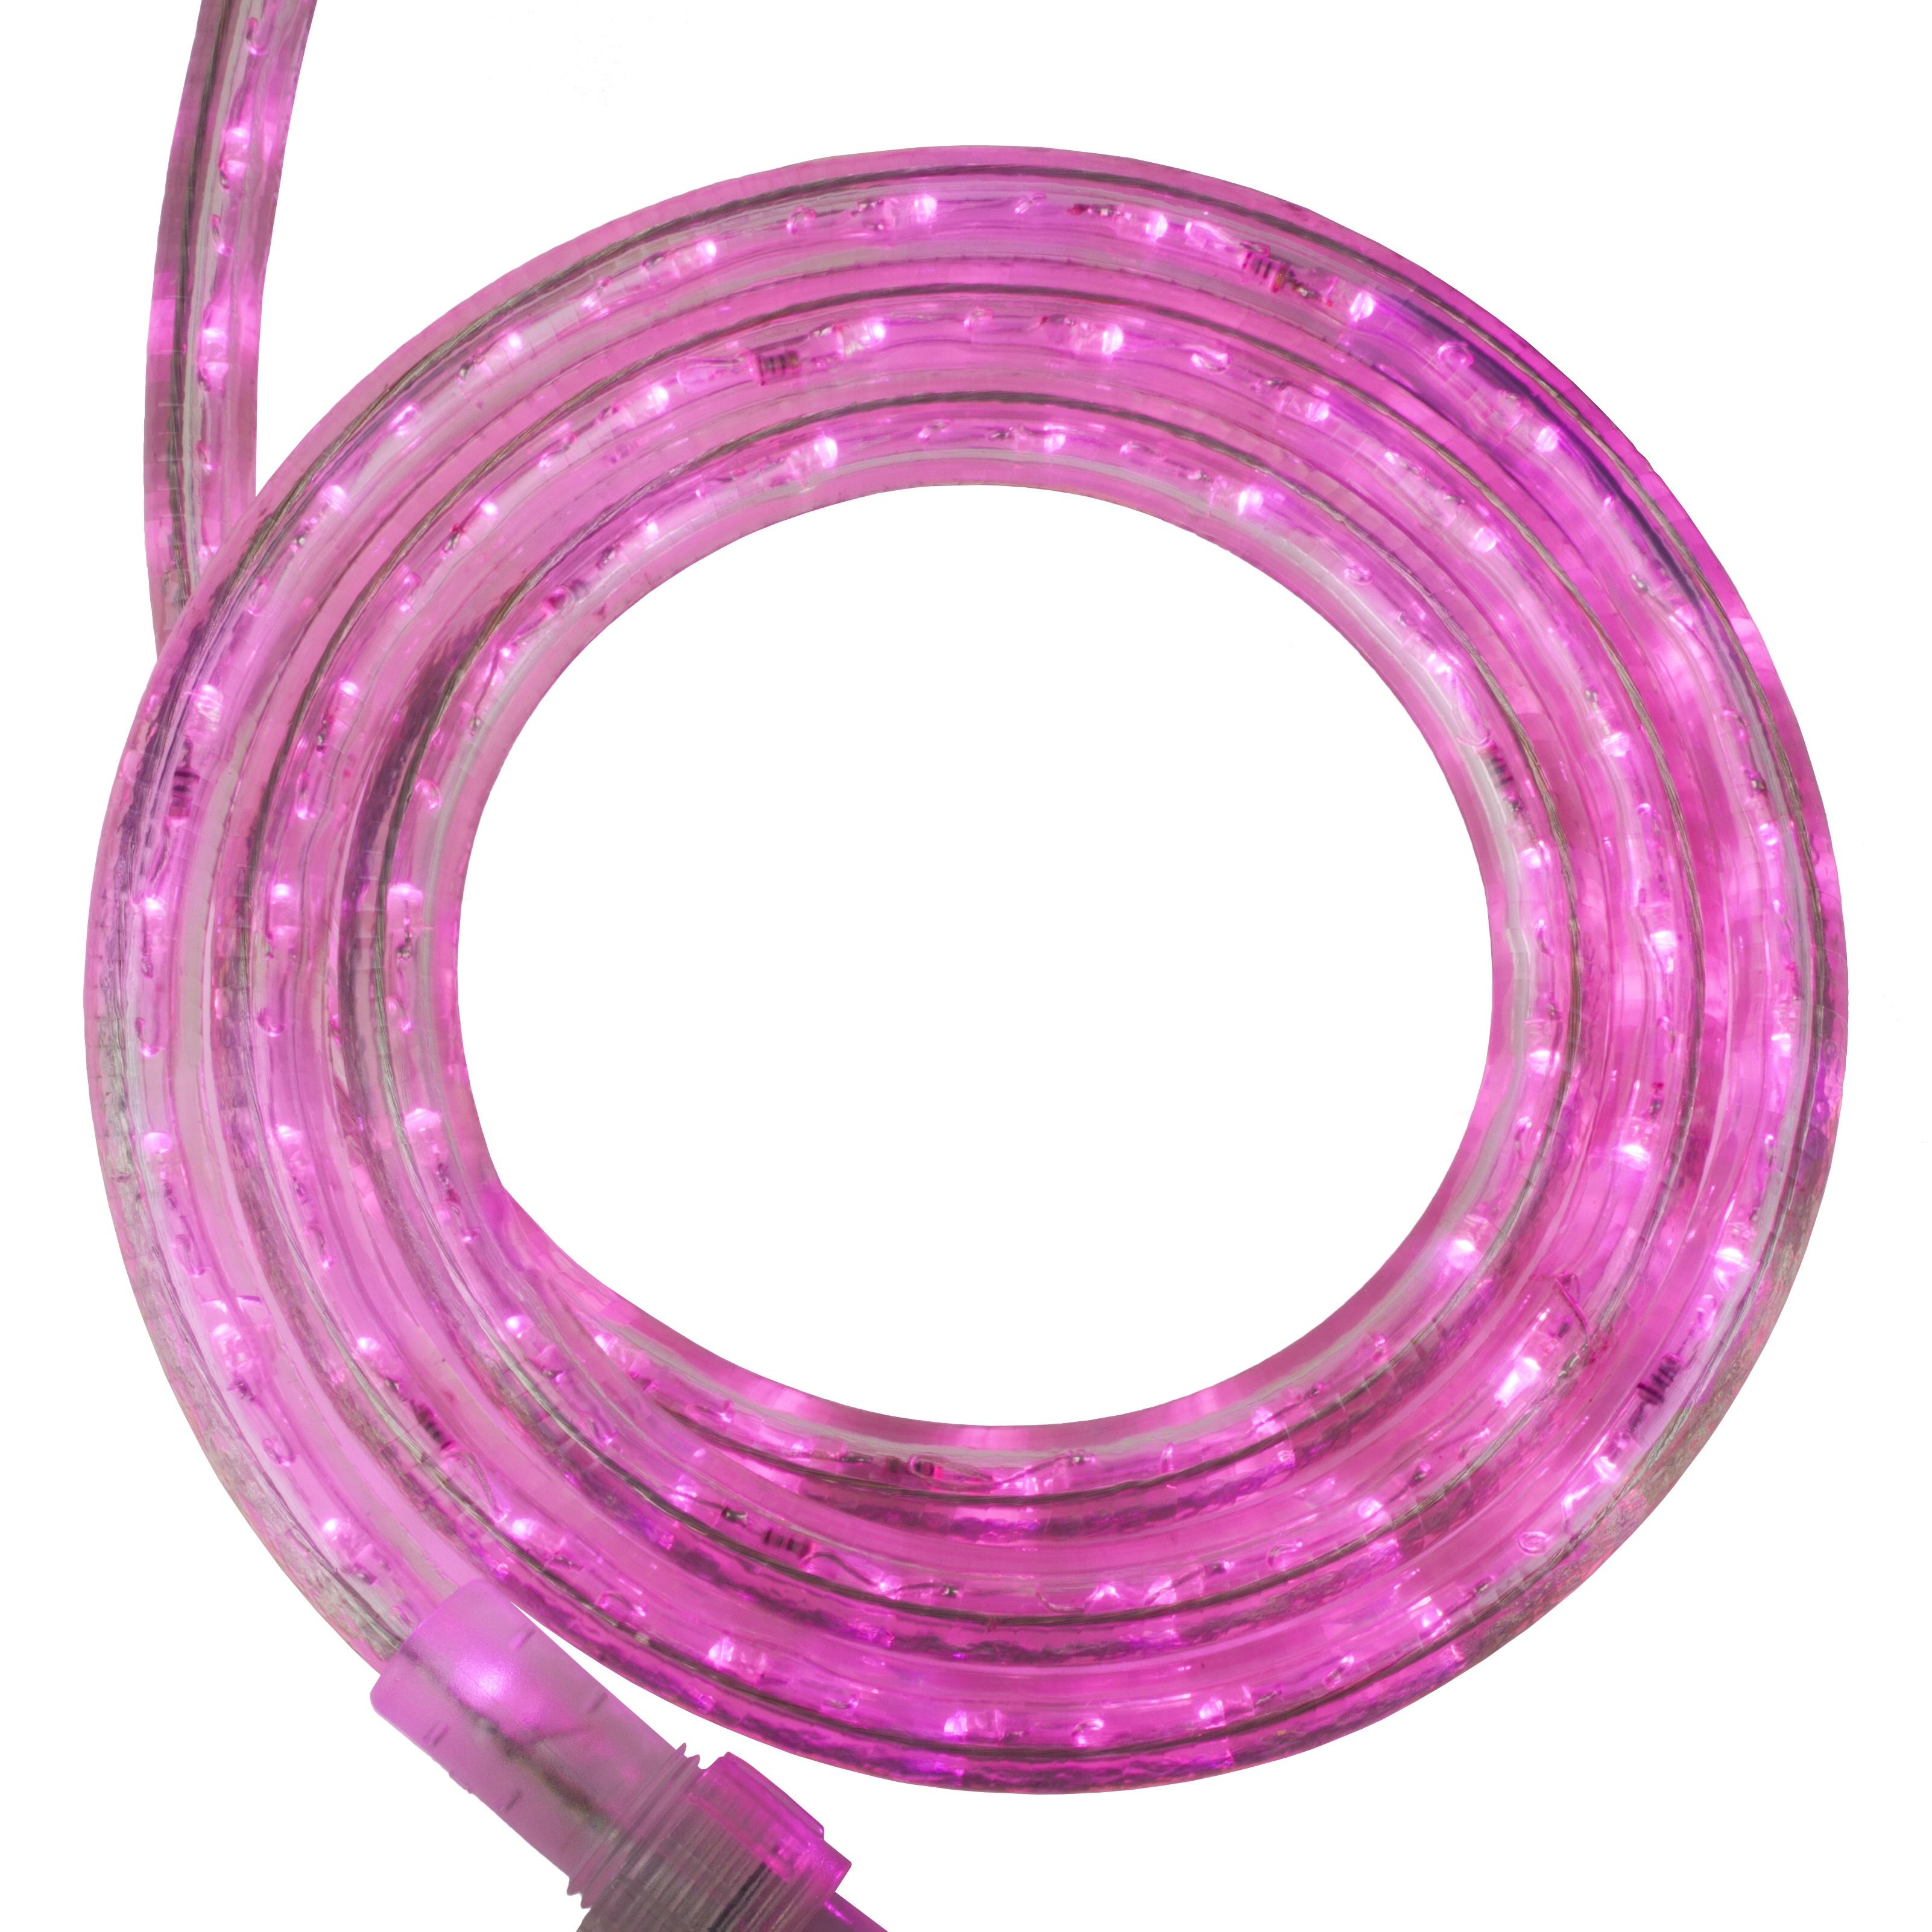 Led Rope Lighting 30 Pink Led Rope Light 120 Volt